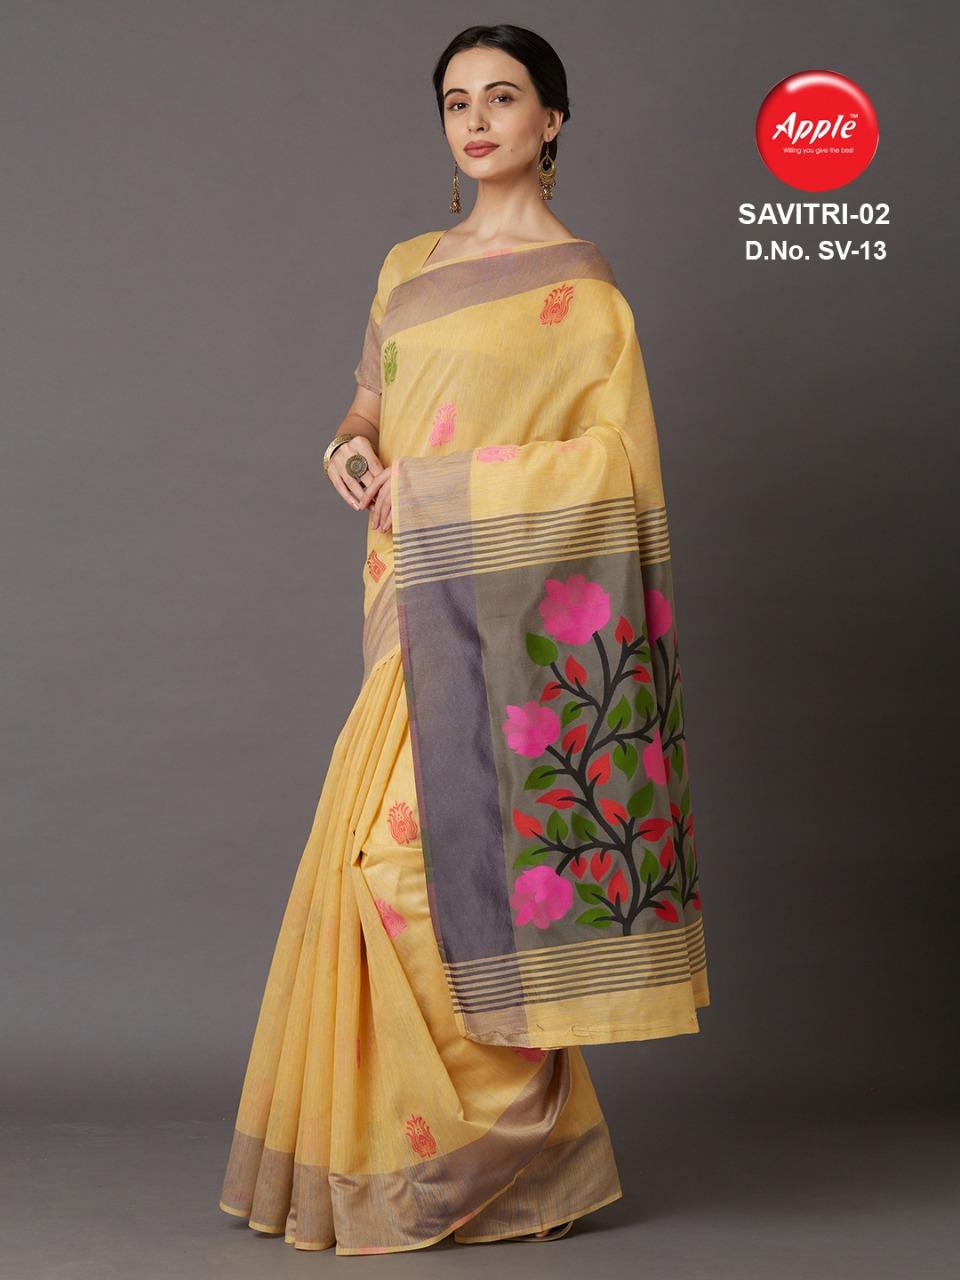 Apple Savitri Vol 1 & 2 Designer Cotton Silk Weaving Sarees Wholesale